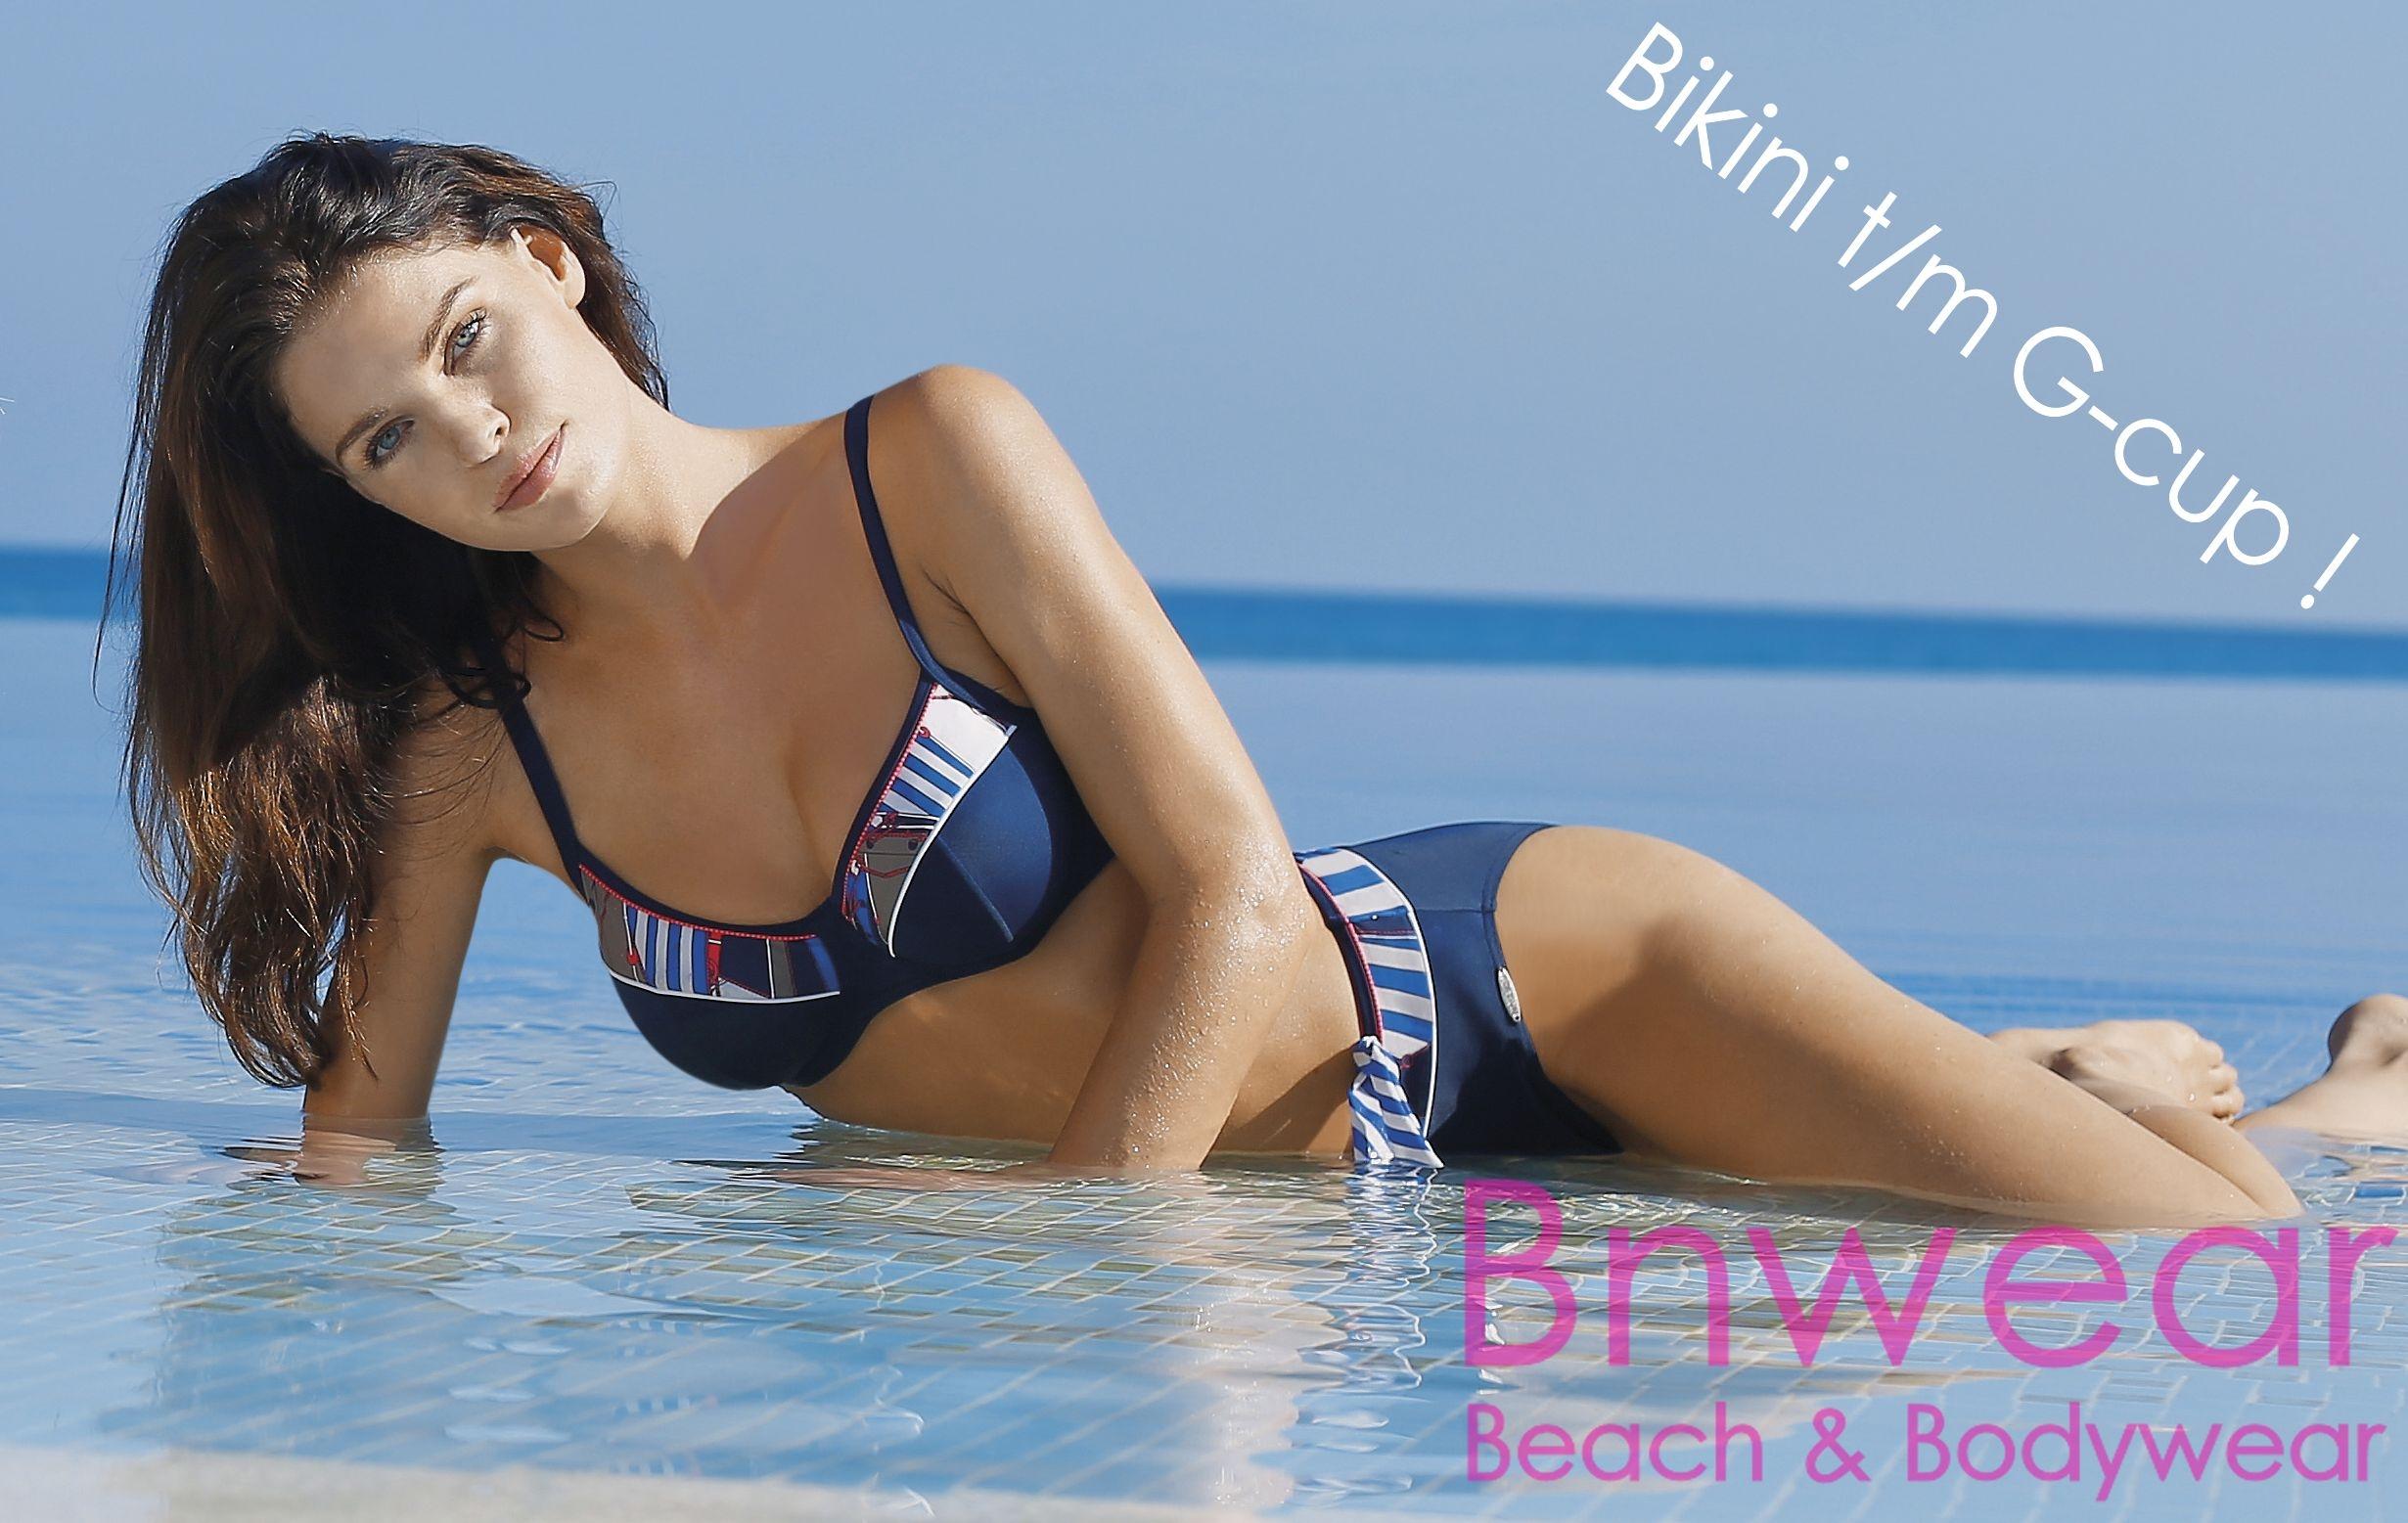 Strapless Badpak Grote Cupmaat.Bikini In Marine Sunflair Serie Sailor Girl Nr 21041